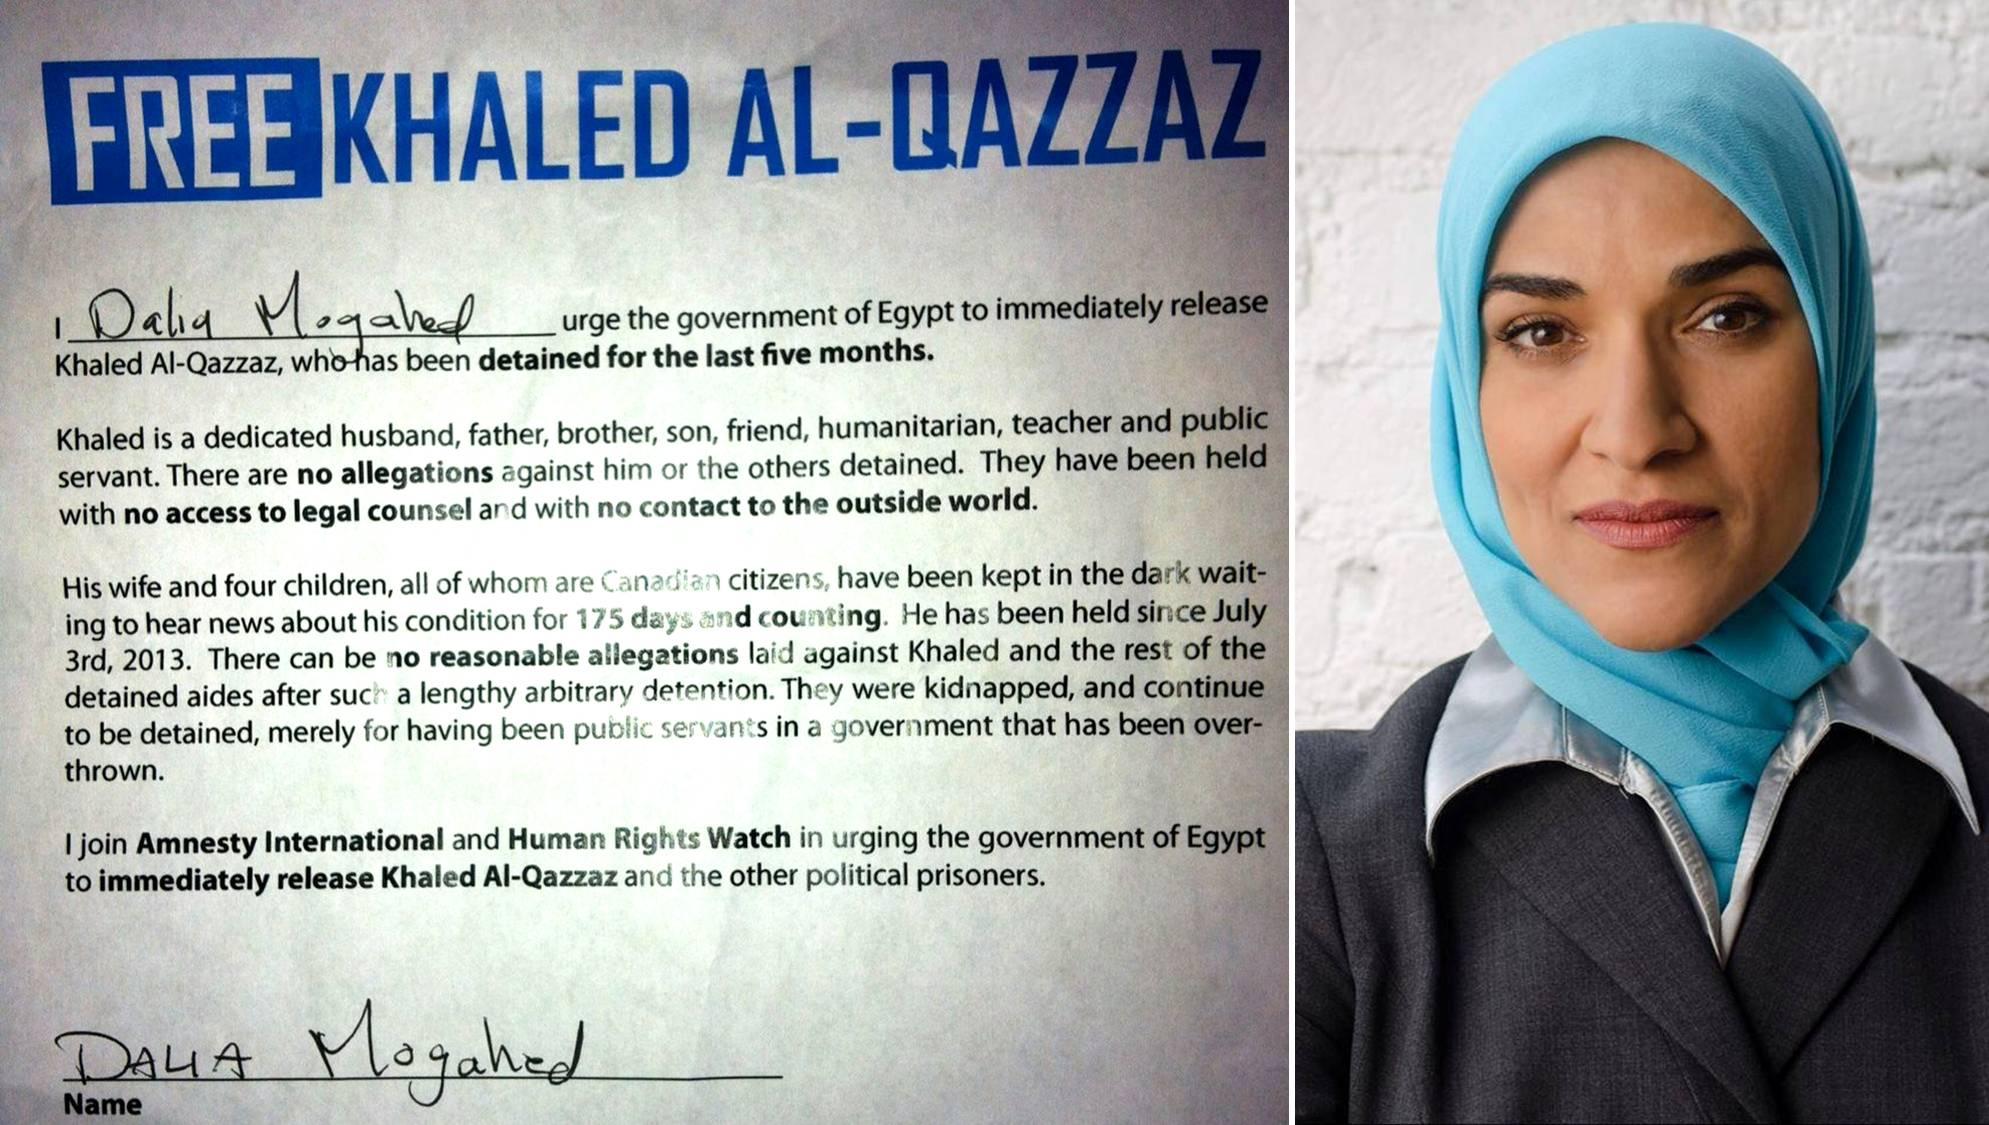 Dalia-Mogahed.jpg